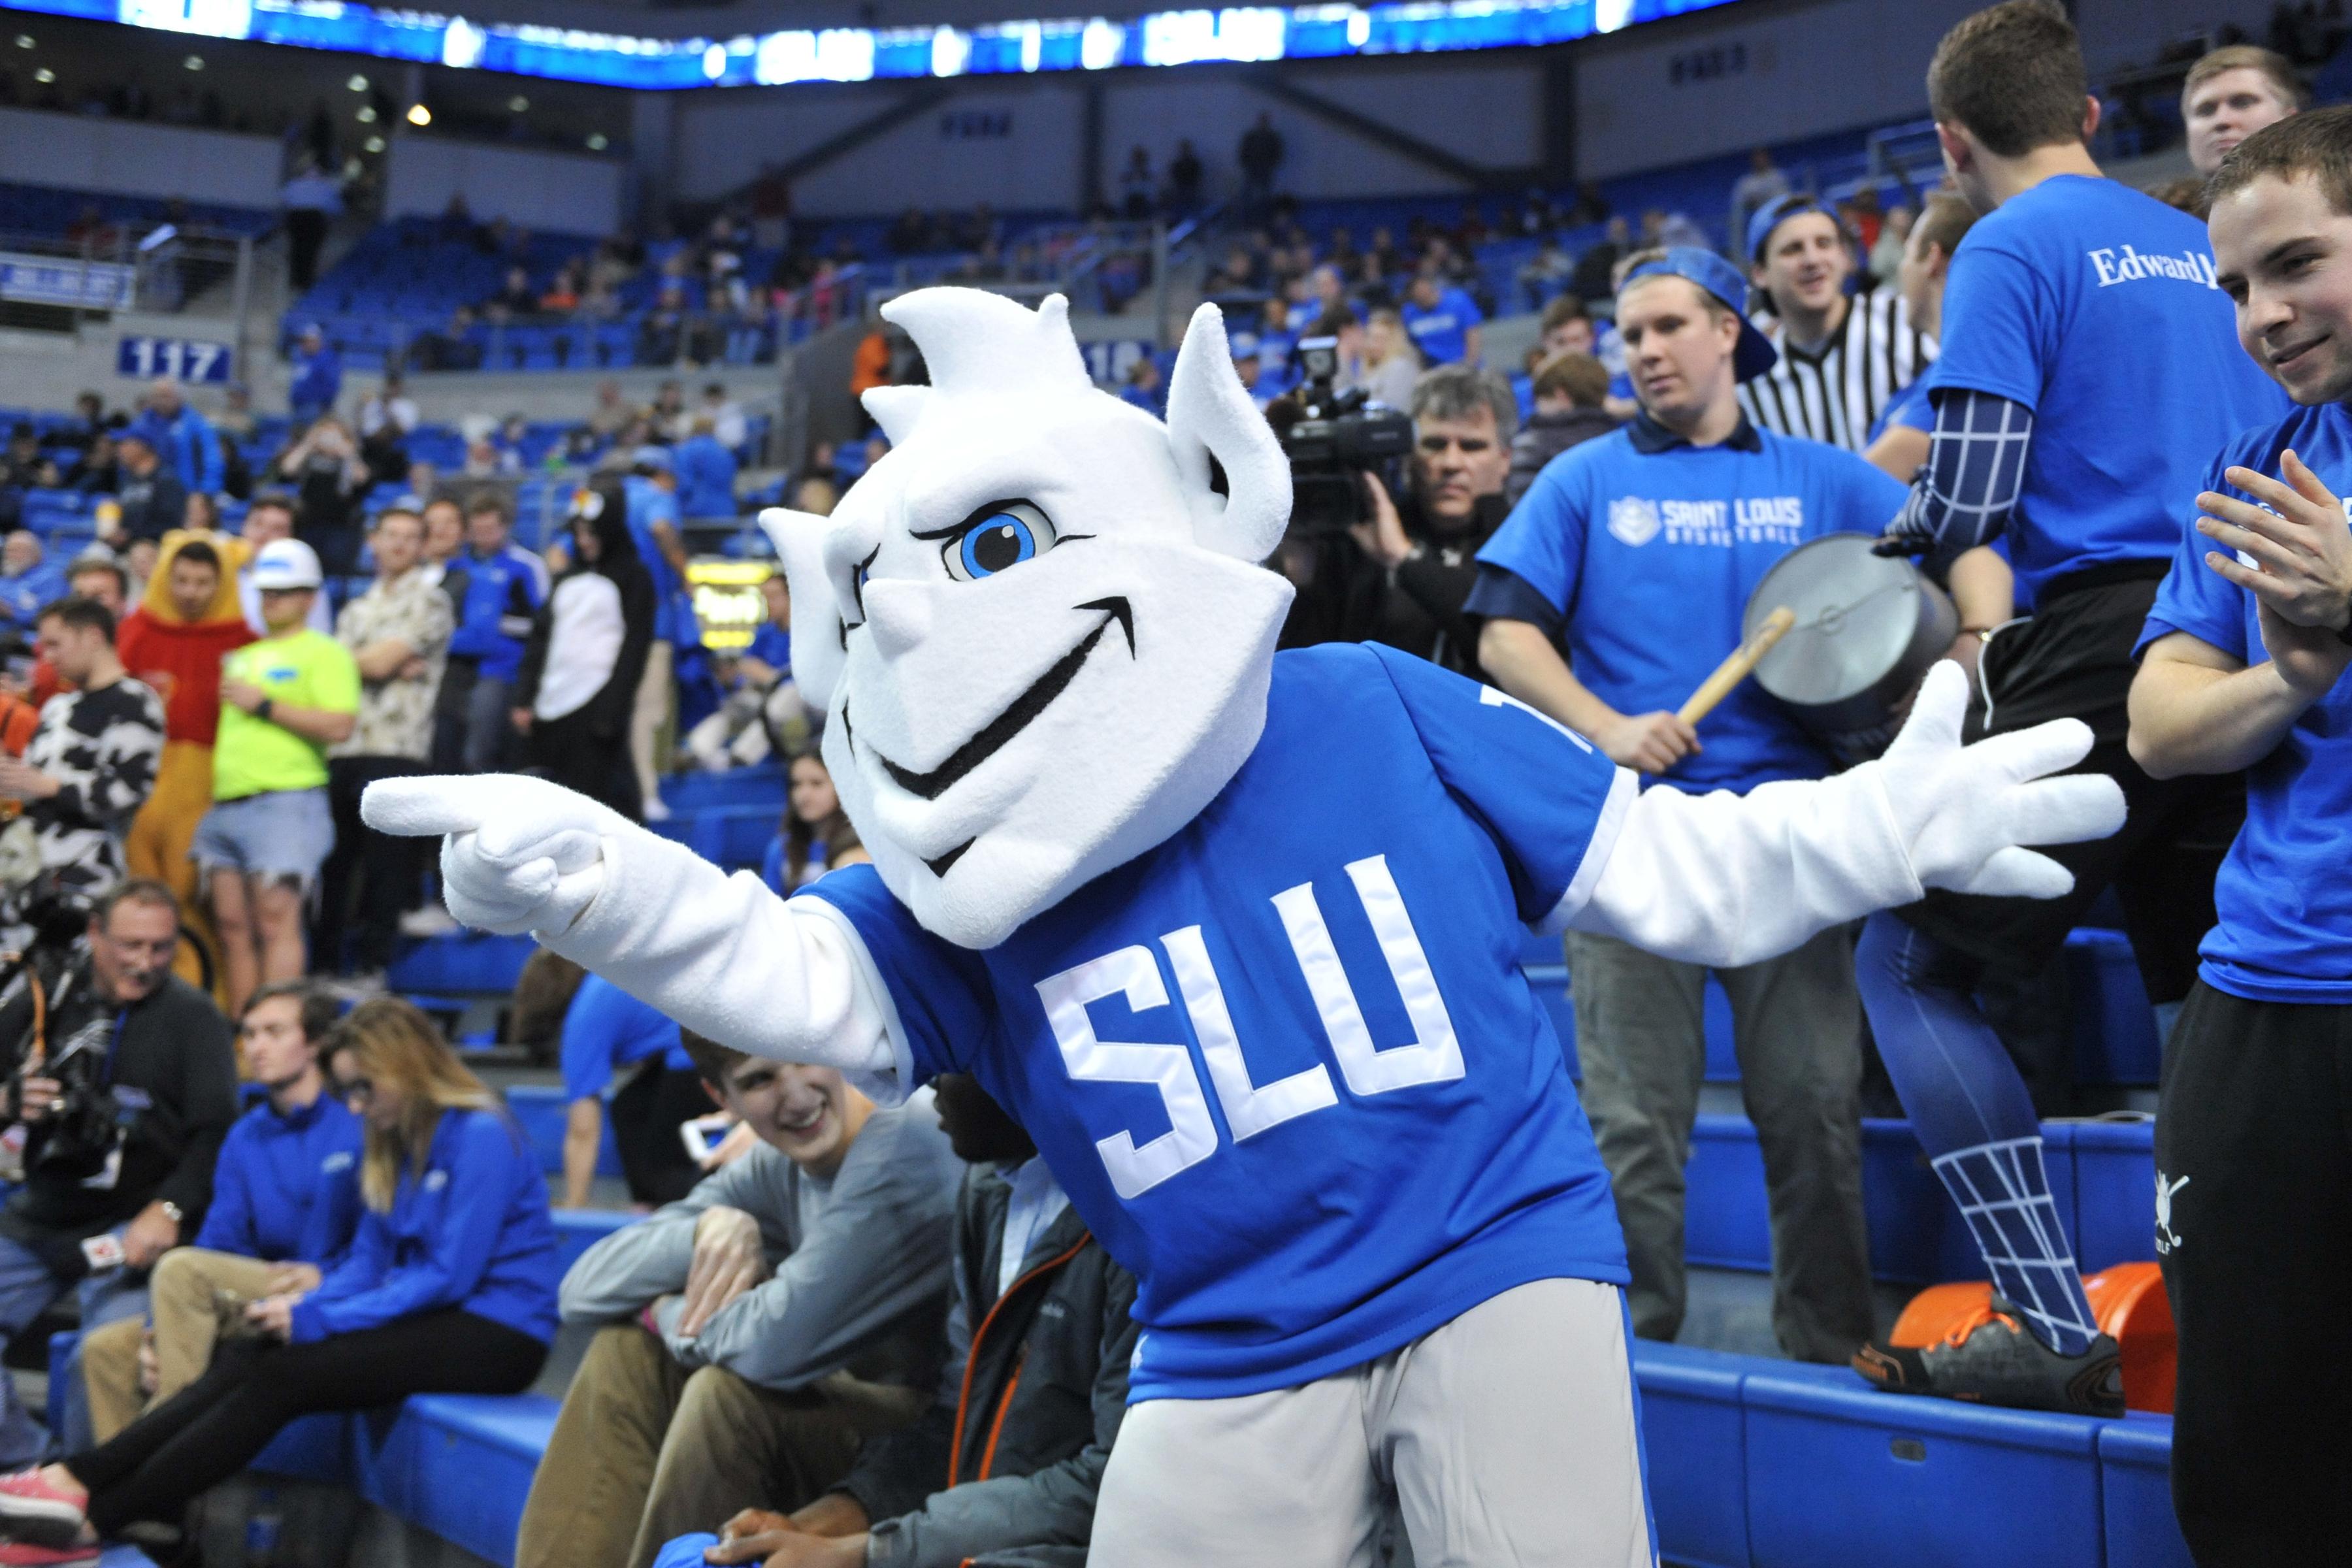 college mascots SLU Mascot